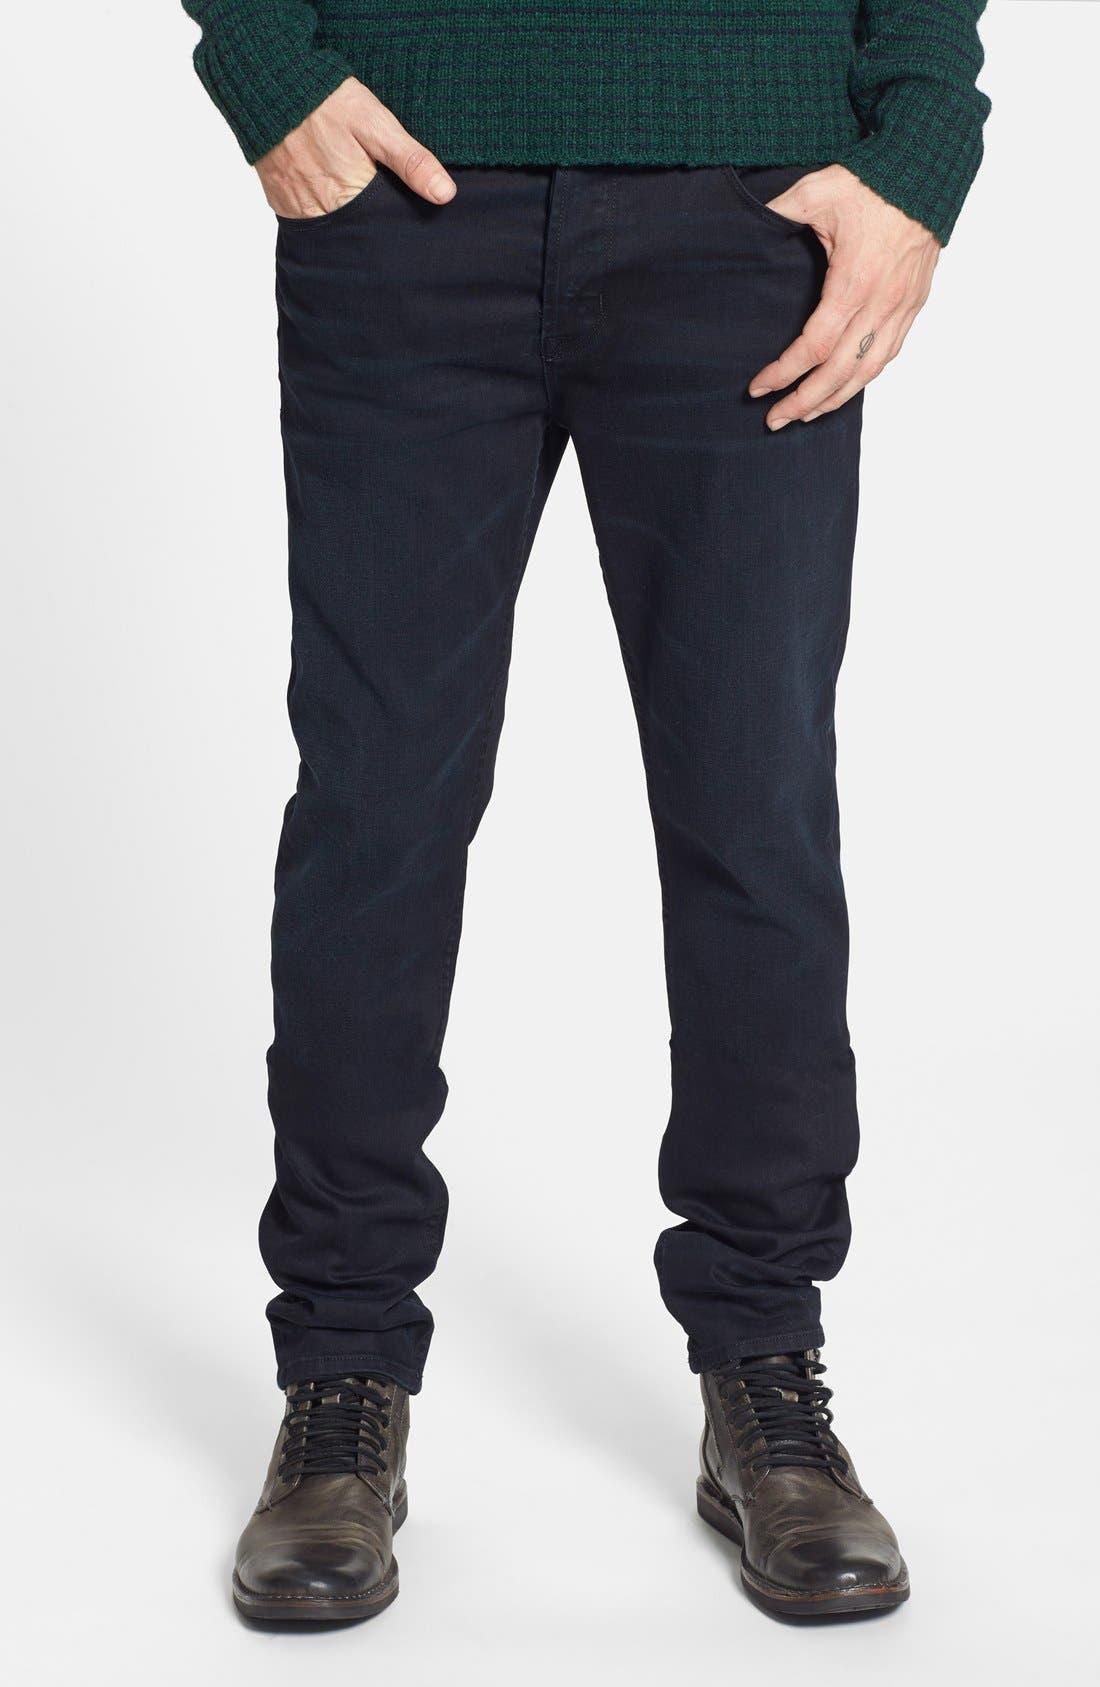 Alternate Image 1 Selected - Hudson Jeans 'Sartor' Slouchy Skinny Fit Jeans (Sanction)